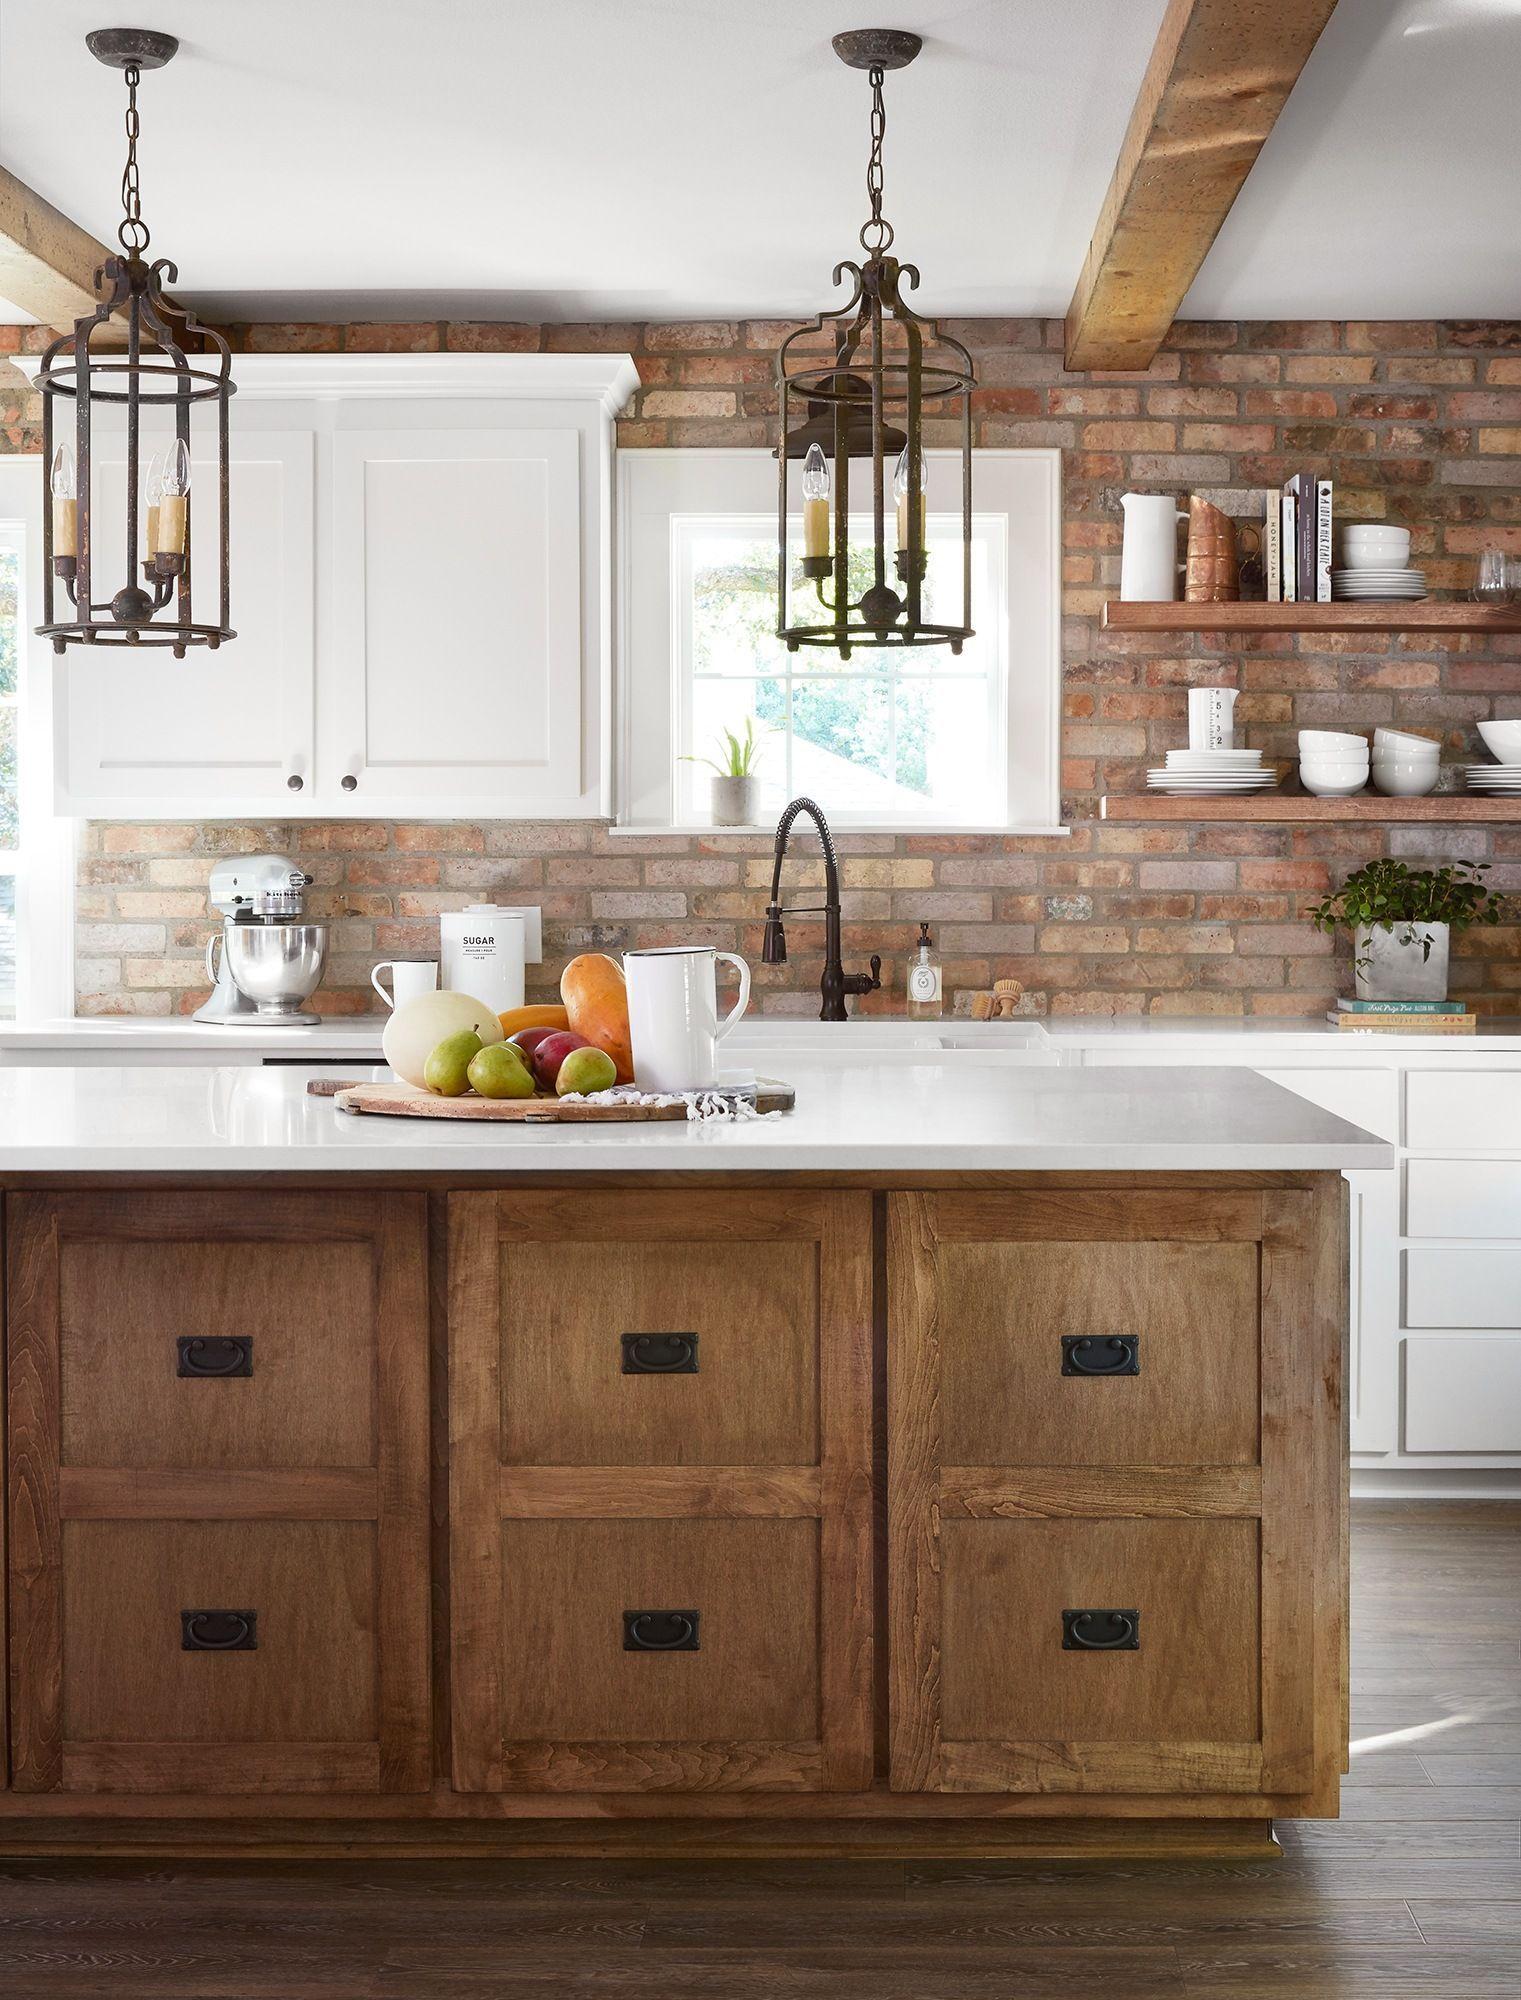 episode 3 season 5 in 2019 house stuff fixer upper kitchen joanna gaines kitchen kitchen on kitchen layout ideas with island joanna gaines id=20491